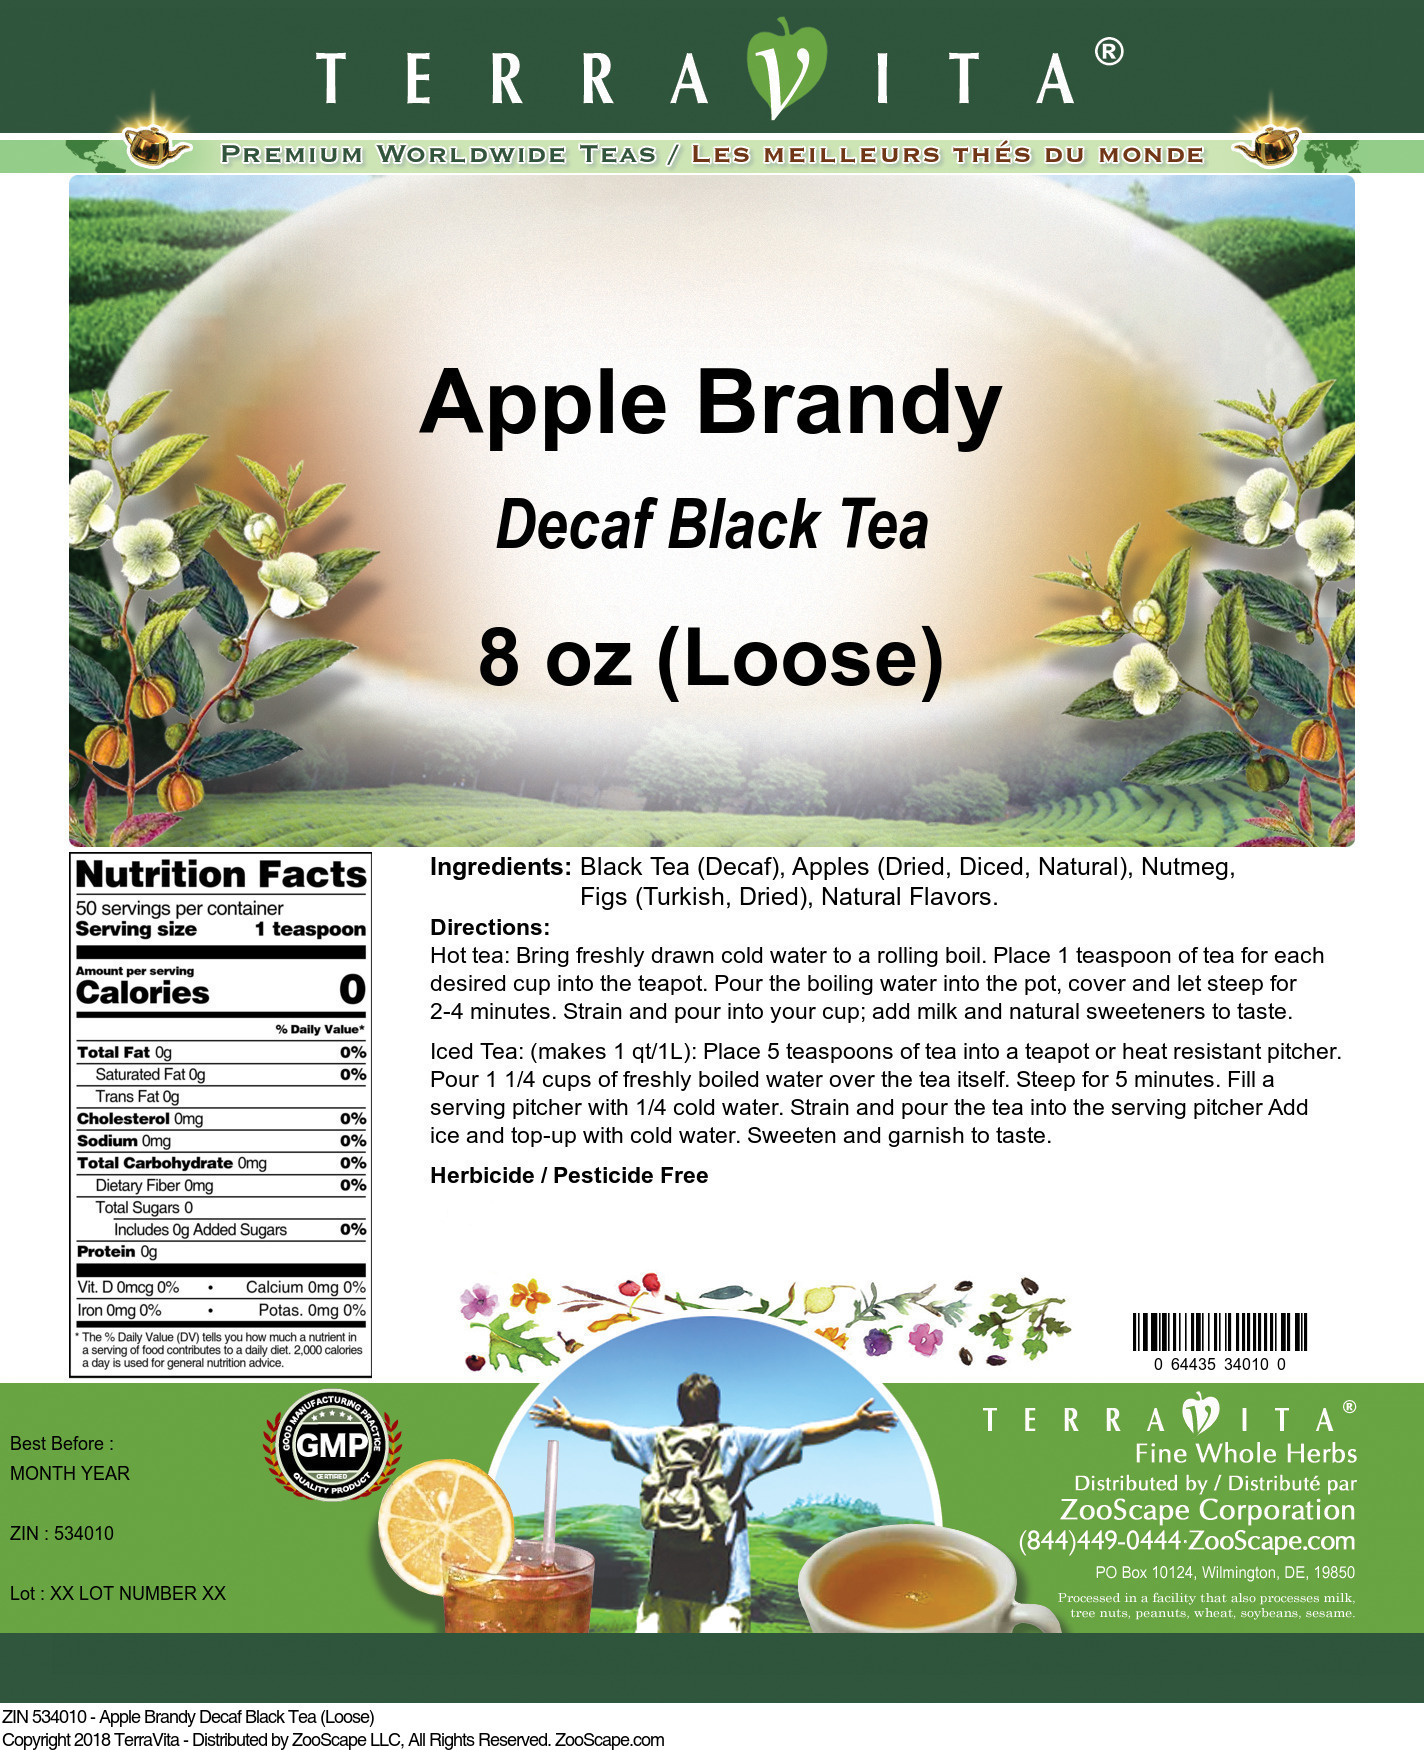 Apple Brandy Decaf Black Tea